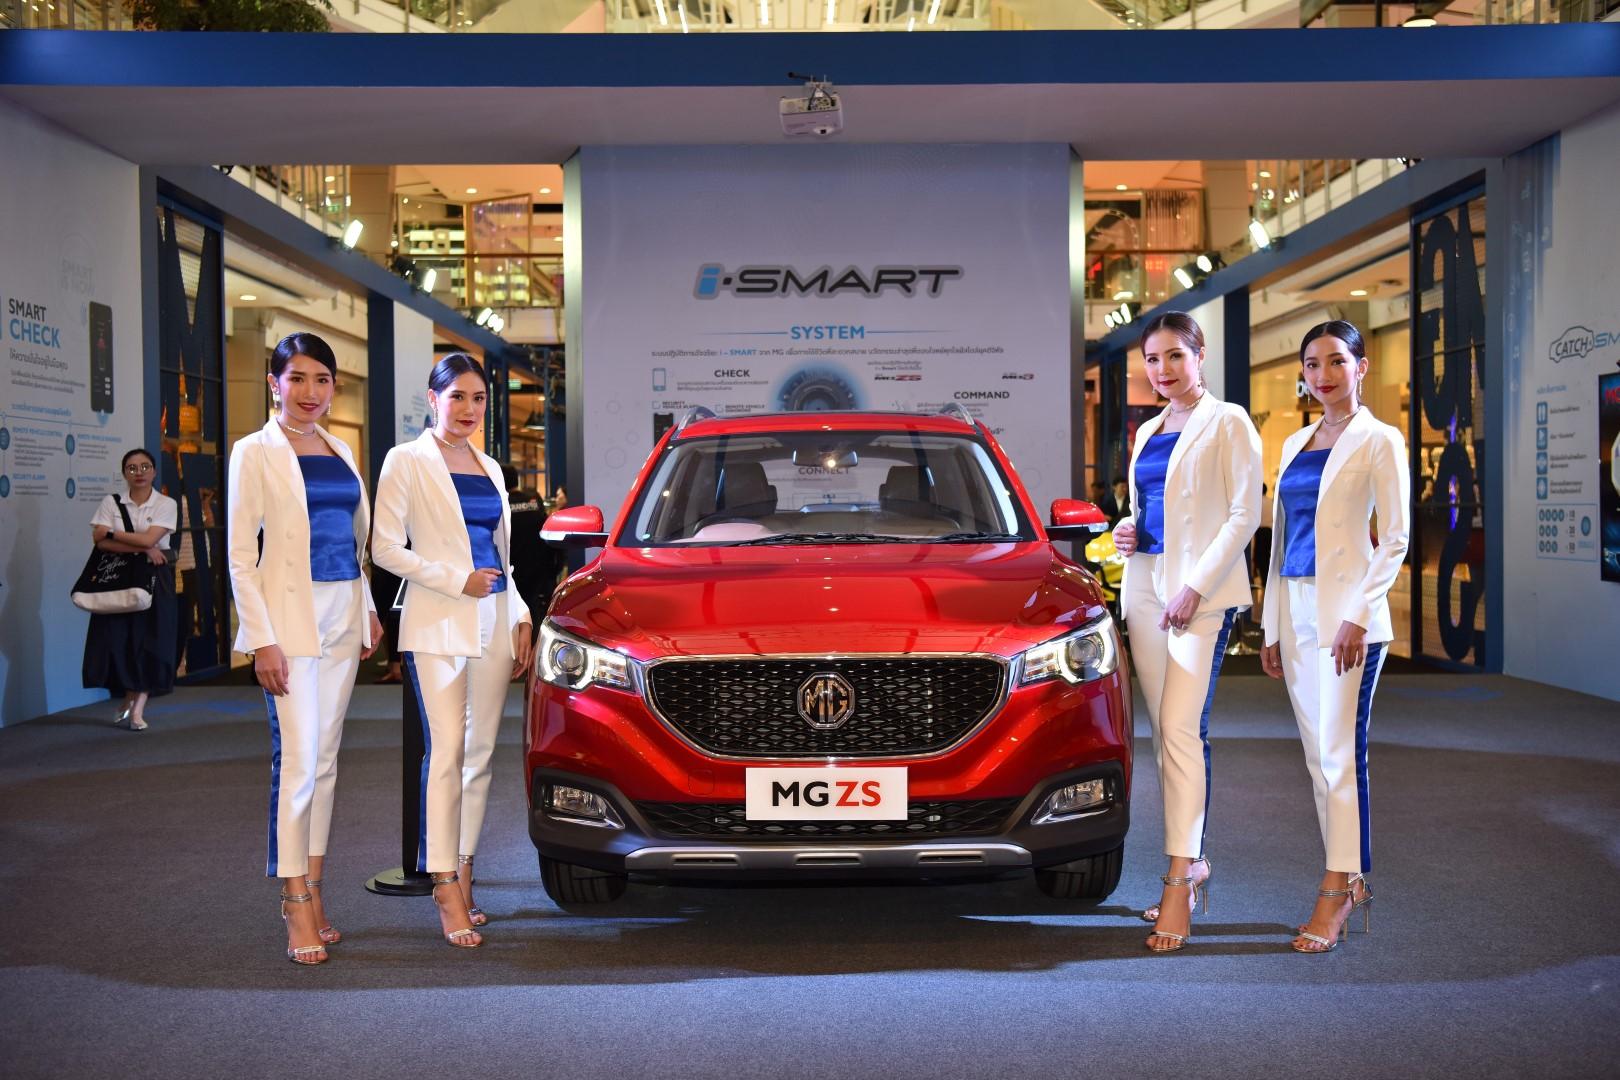 "MG Expo 2018  ขนทัพรถโชว์เทคโนฯ ""i-SMART"" เซ็นทรัลเวิลด์ 29 ต.ค. – 4 พ.ย."